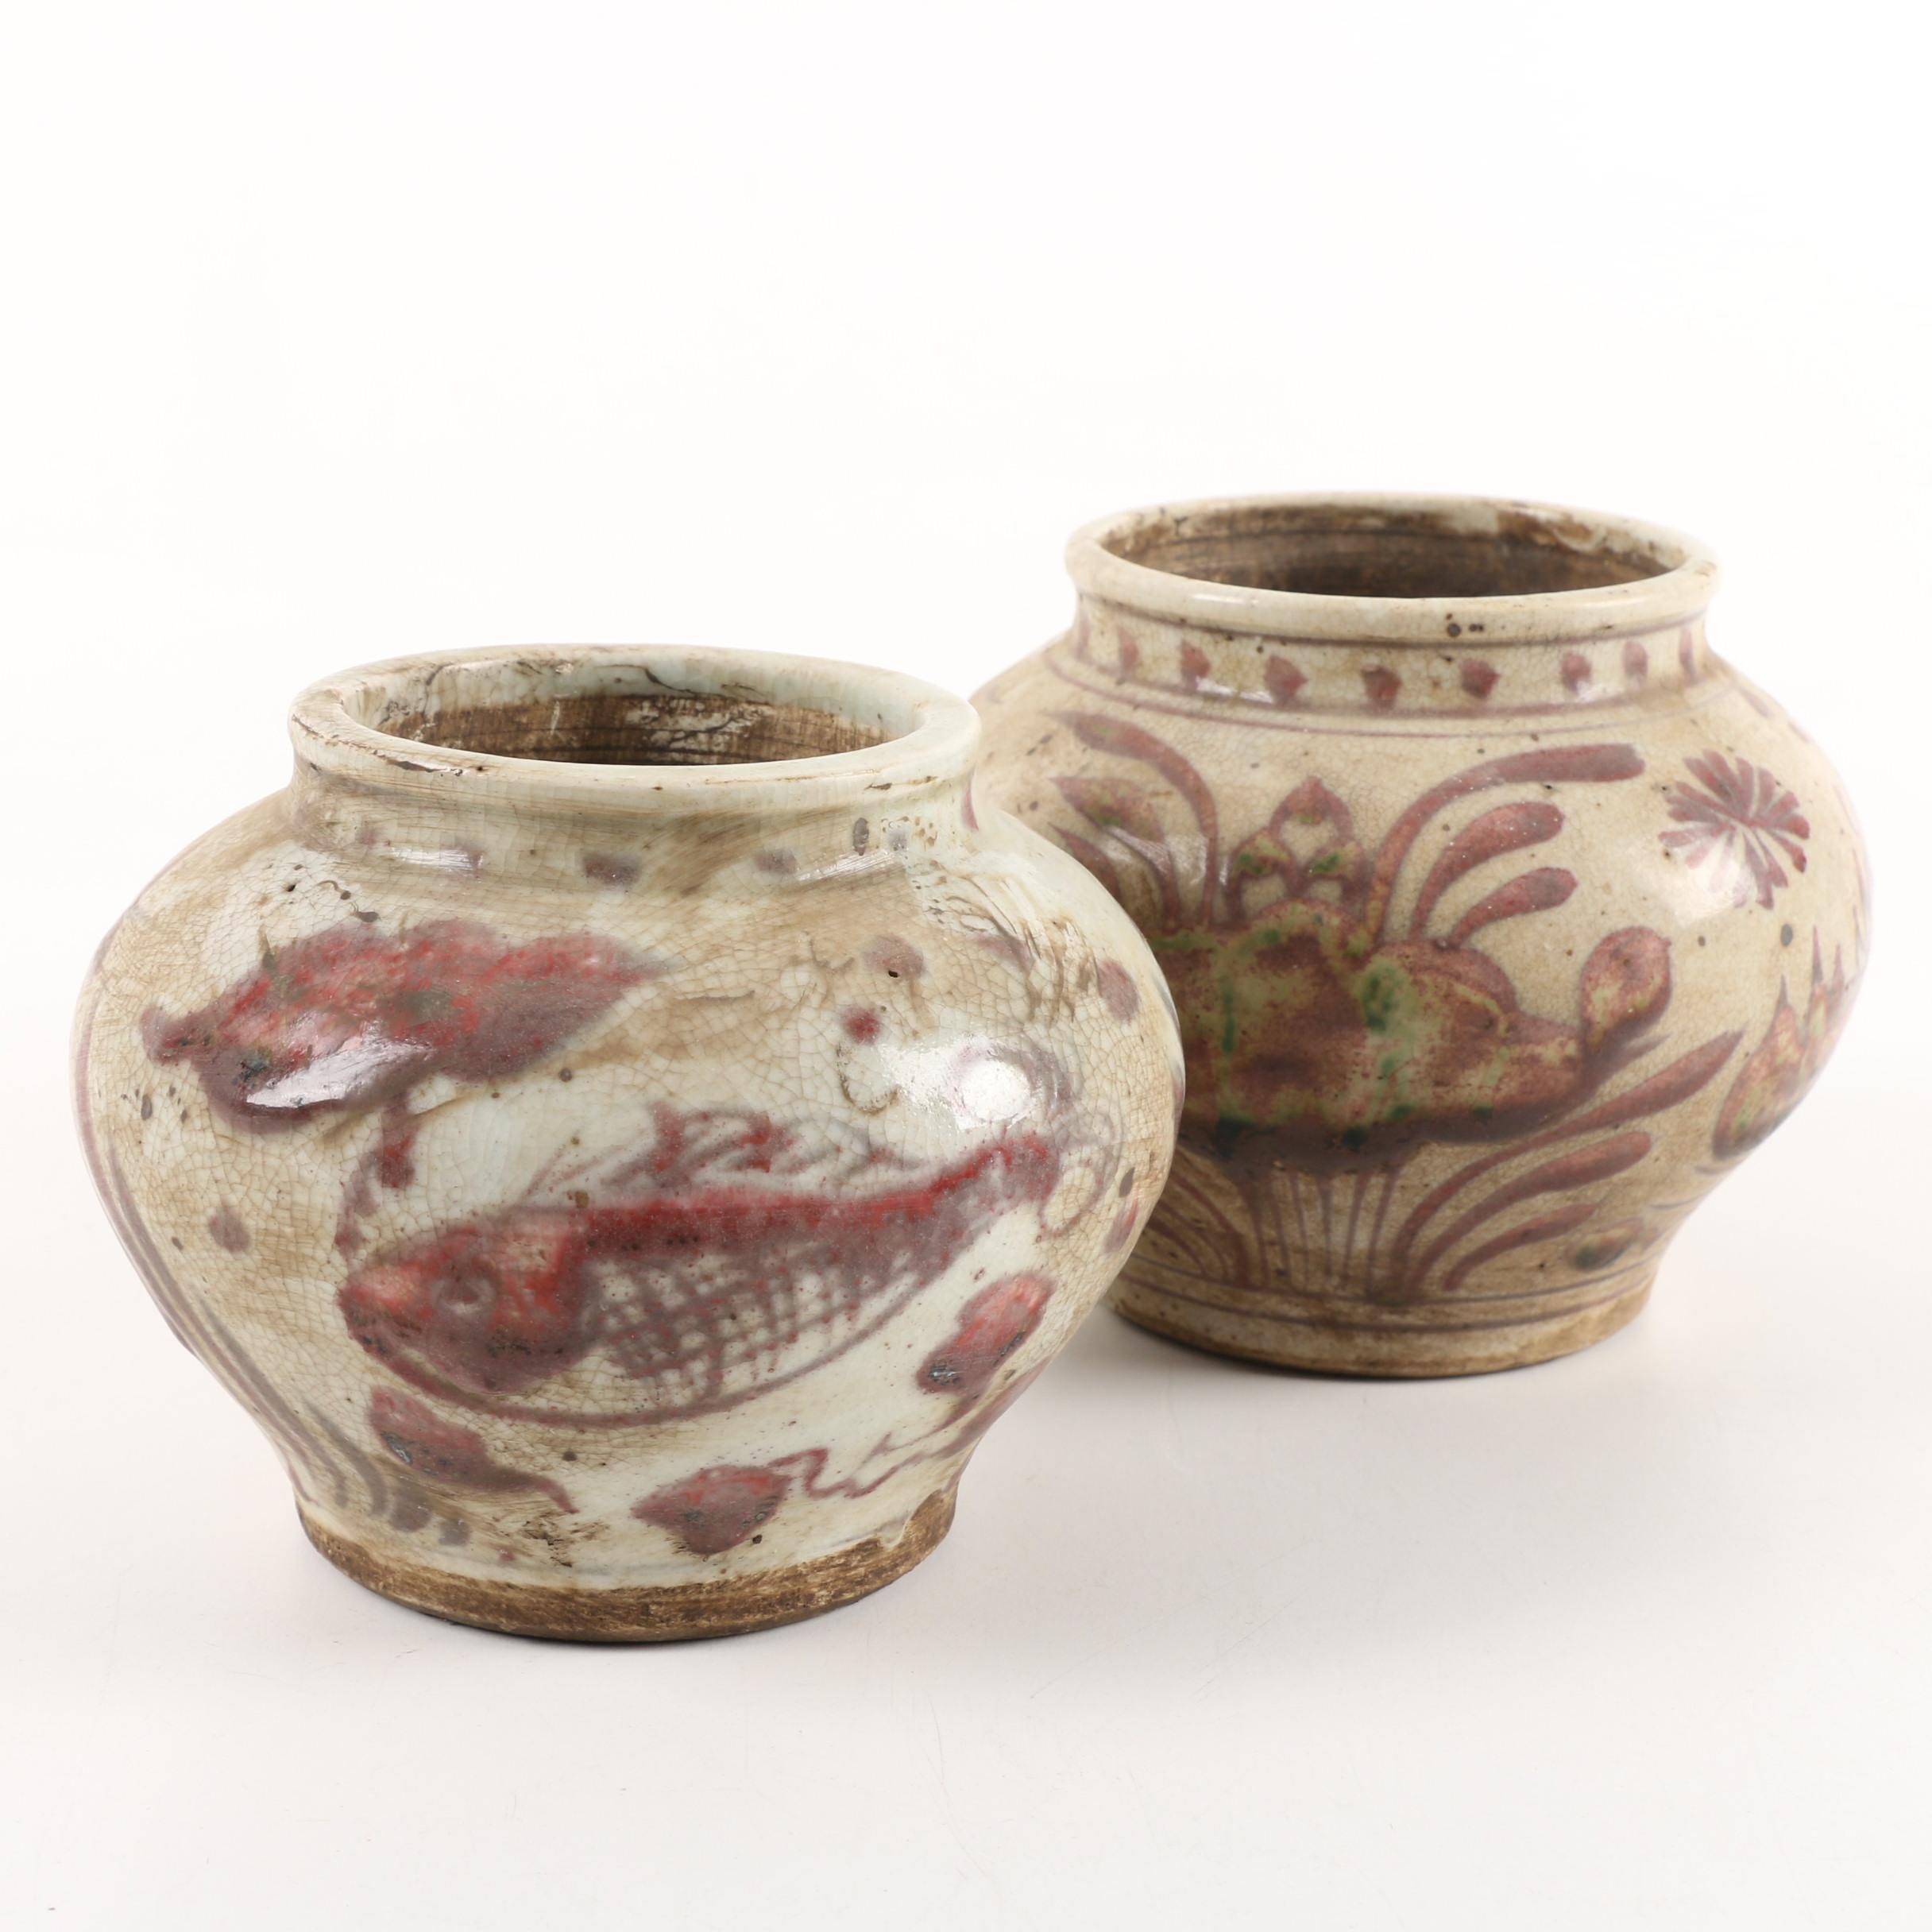 Chinese Tan and Red Fish Motif Ceramic Planters